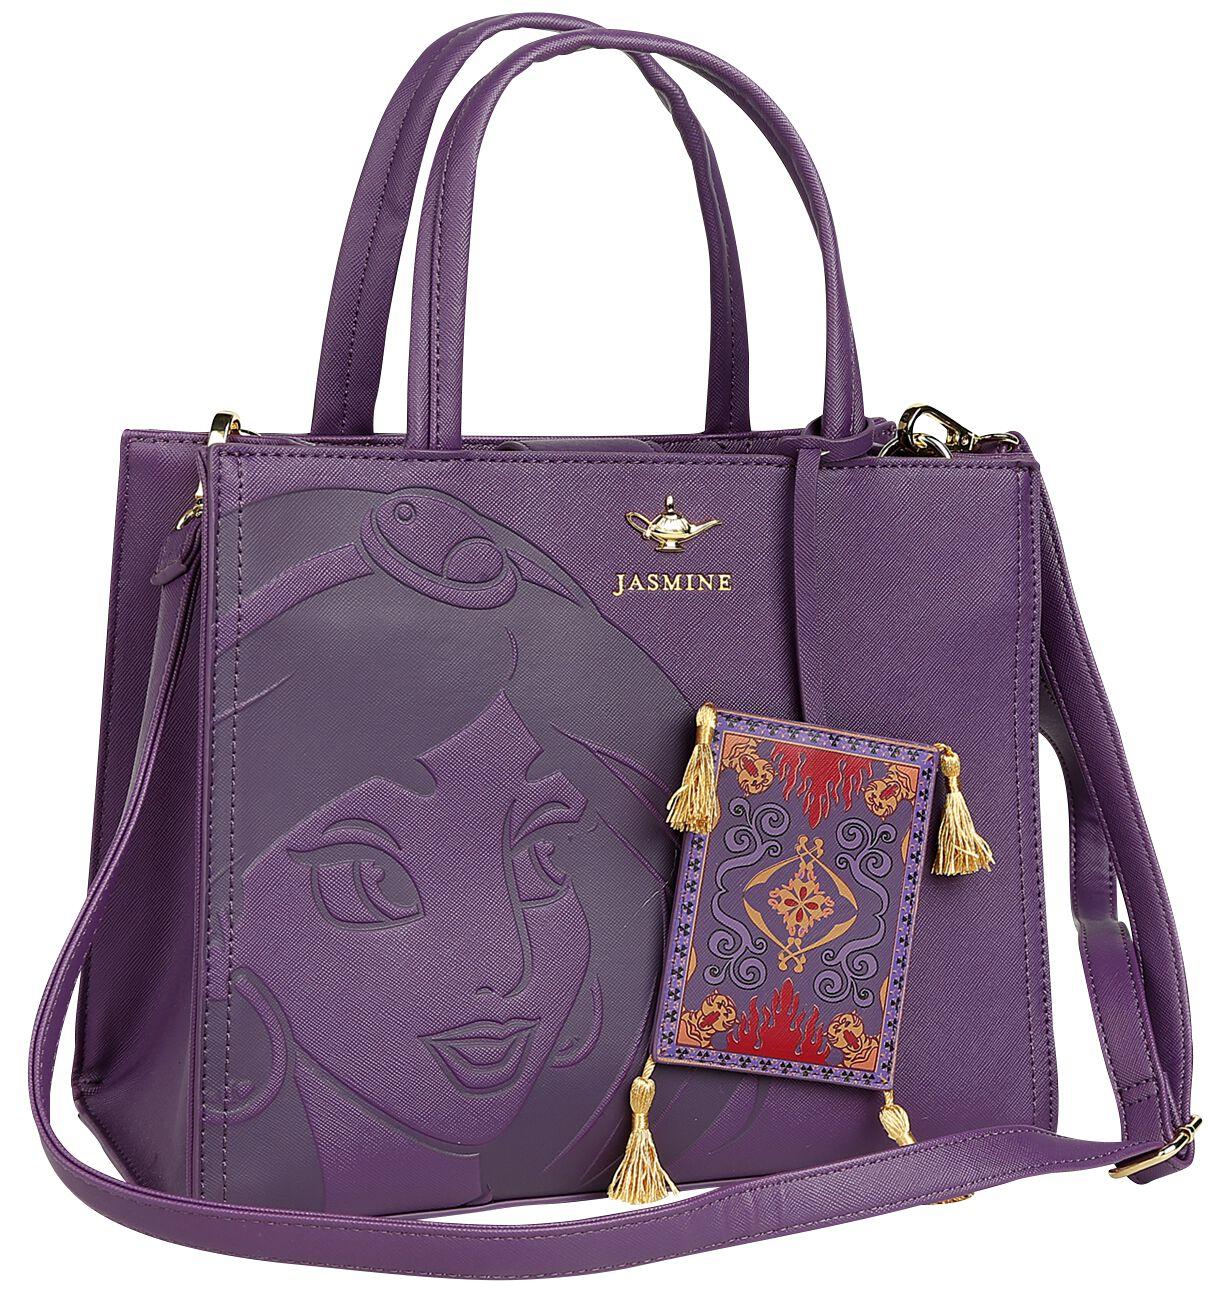 Merch dla Fanów - Torby i Plecaki - Torebka - Handbag Aladyn Jasmine Torebka - Handbag jasnofioletowy (Lilac) - 364128